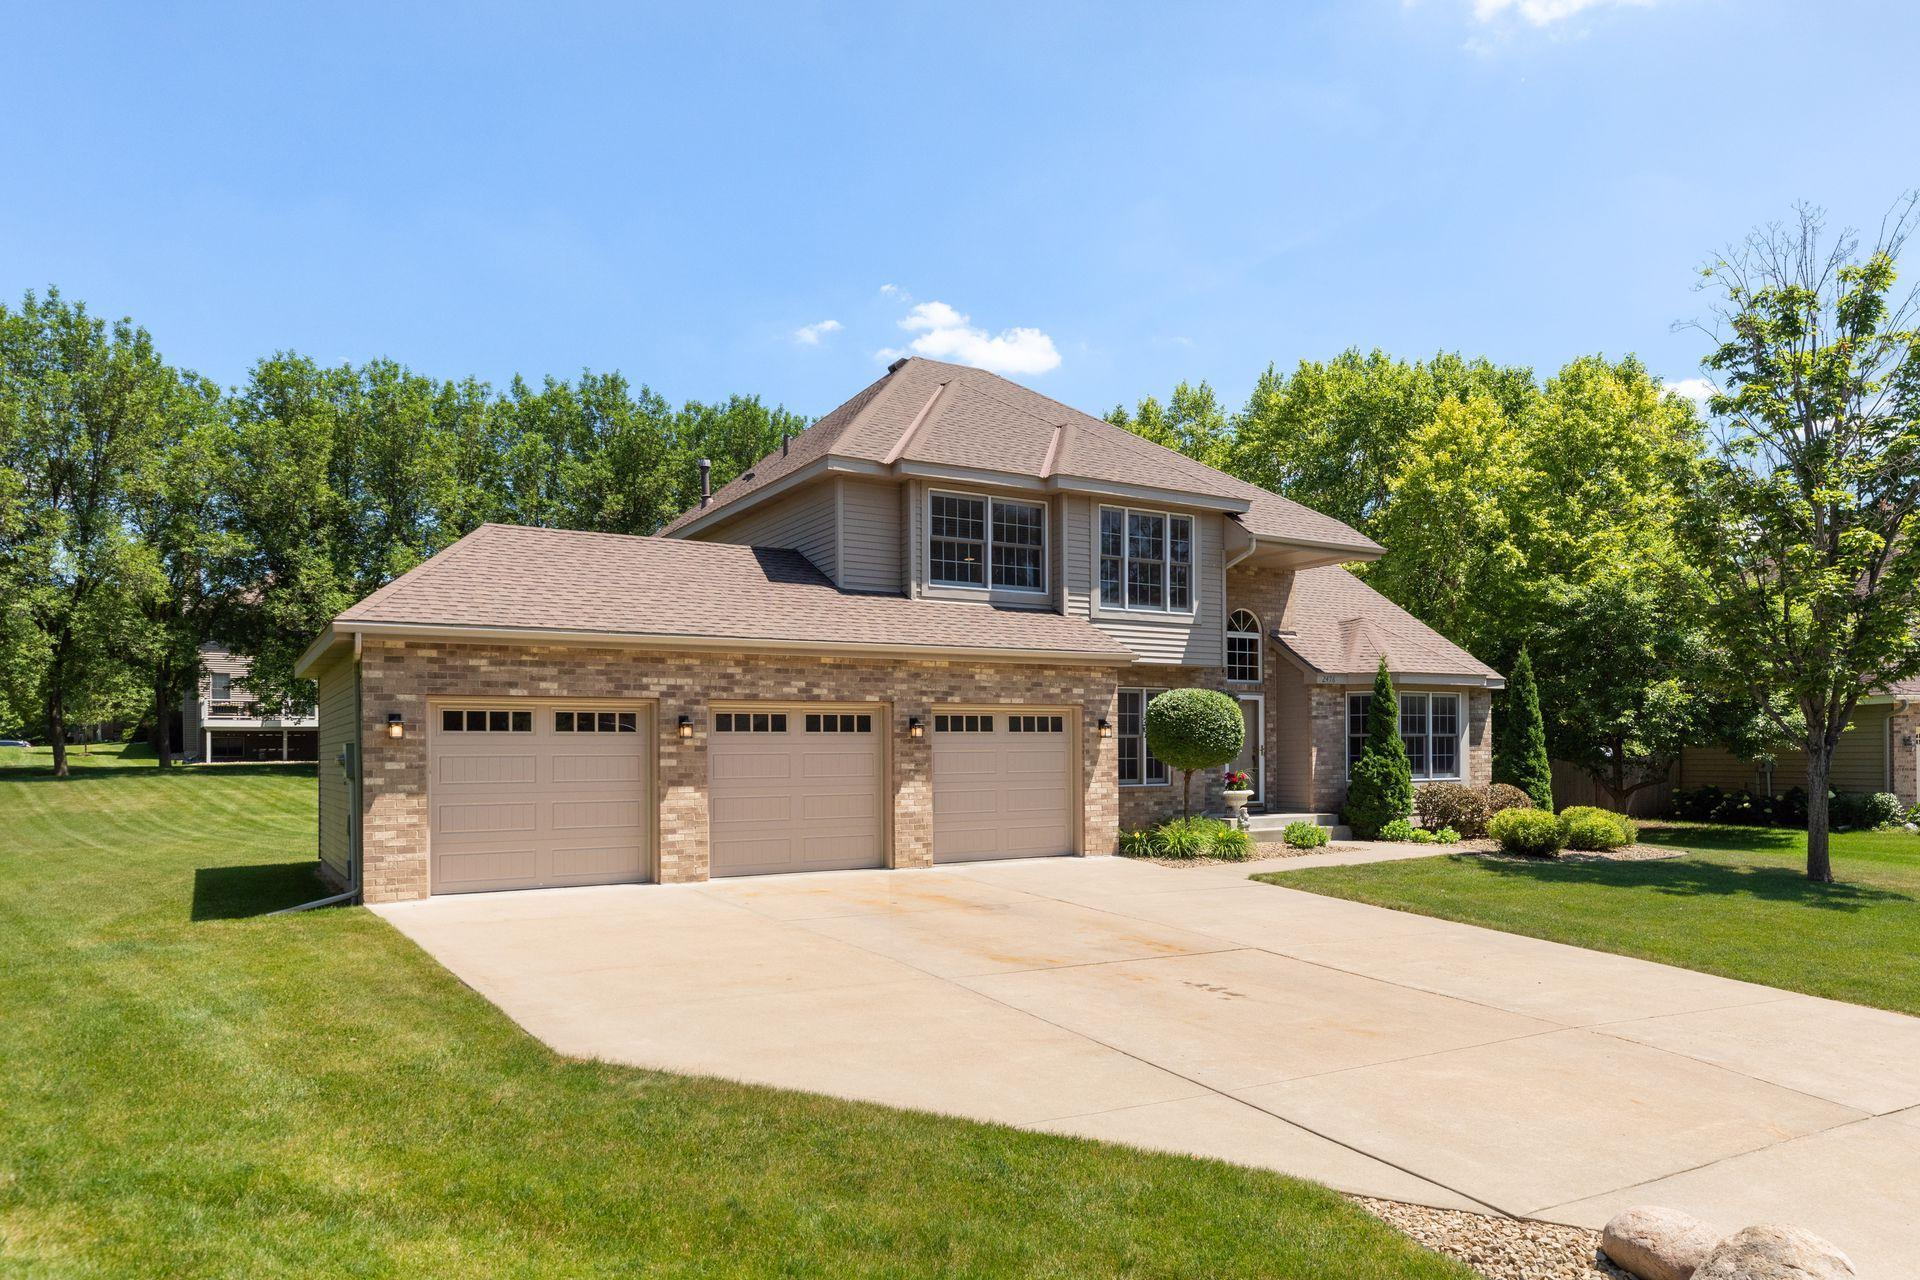 2476 Haverton Property Photo - Mendota Heights, MN real estate listing